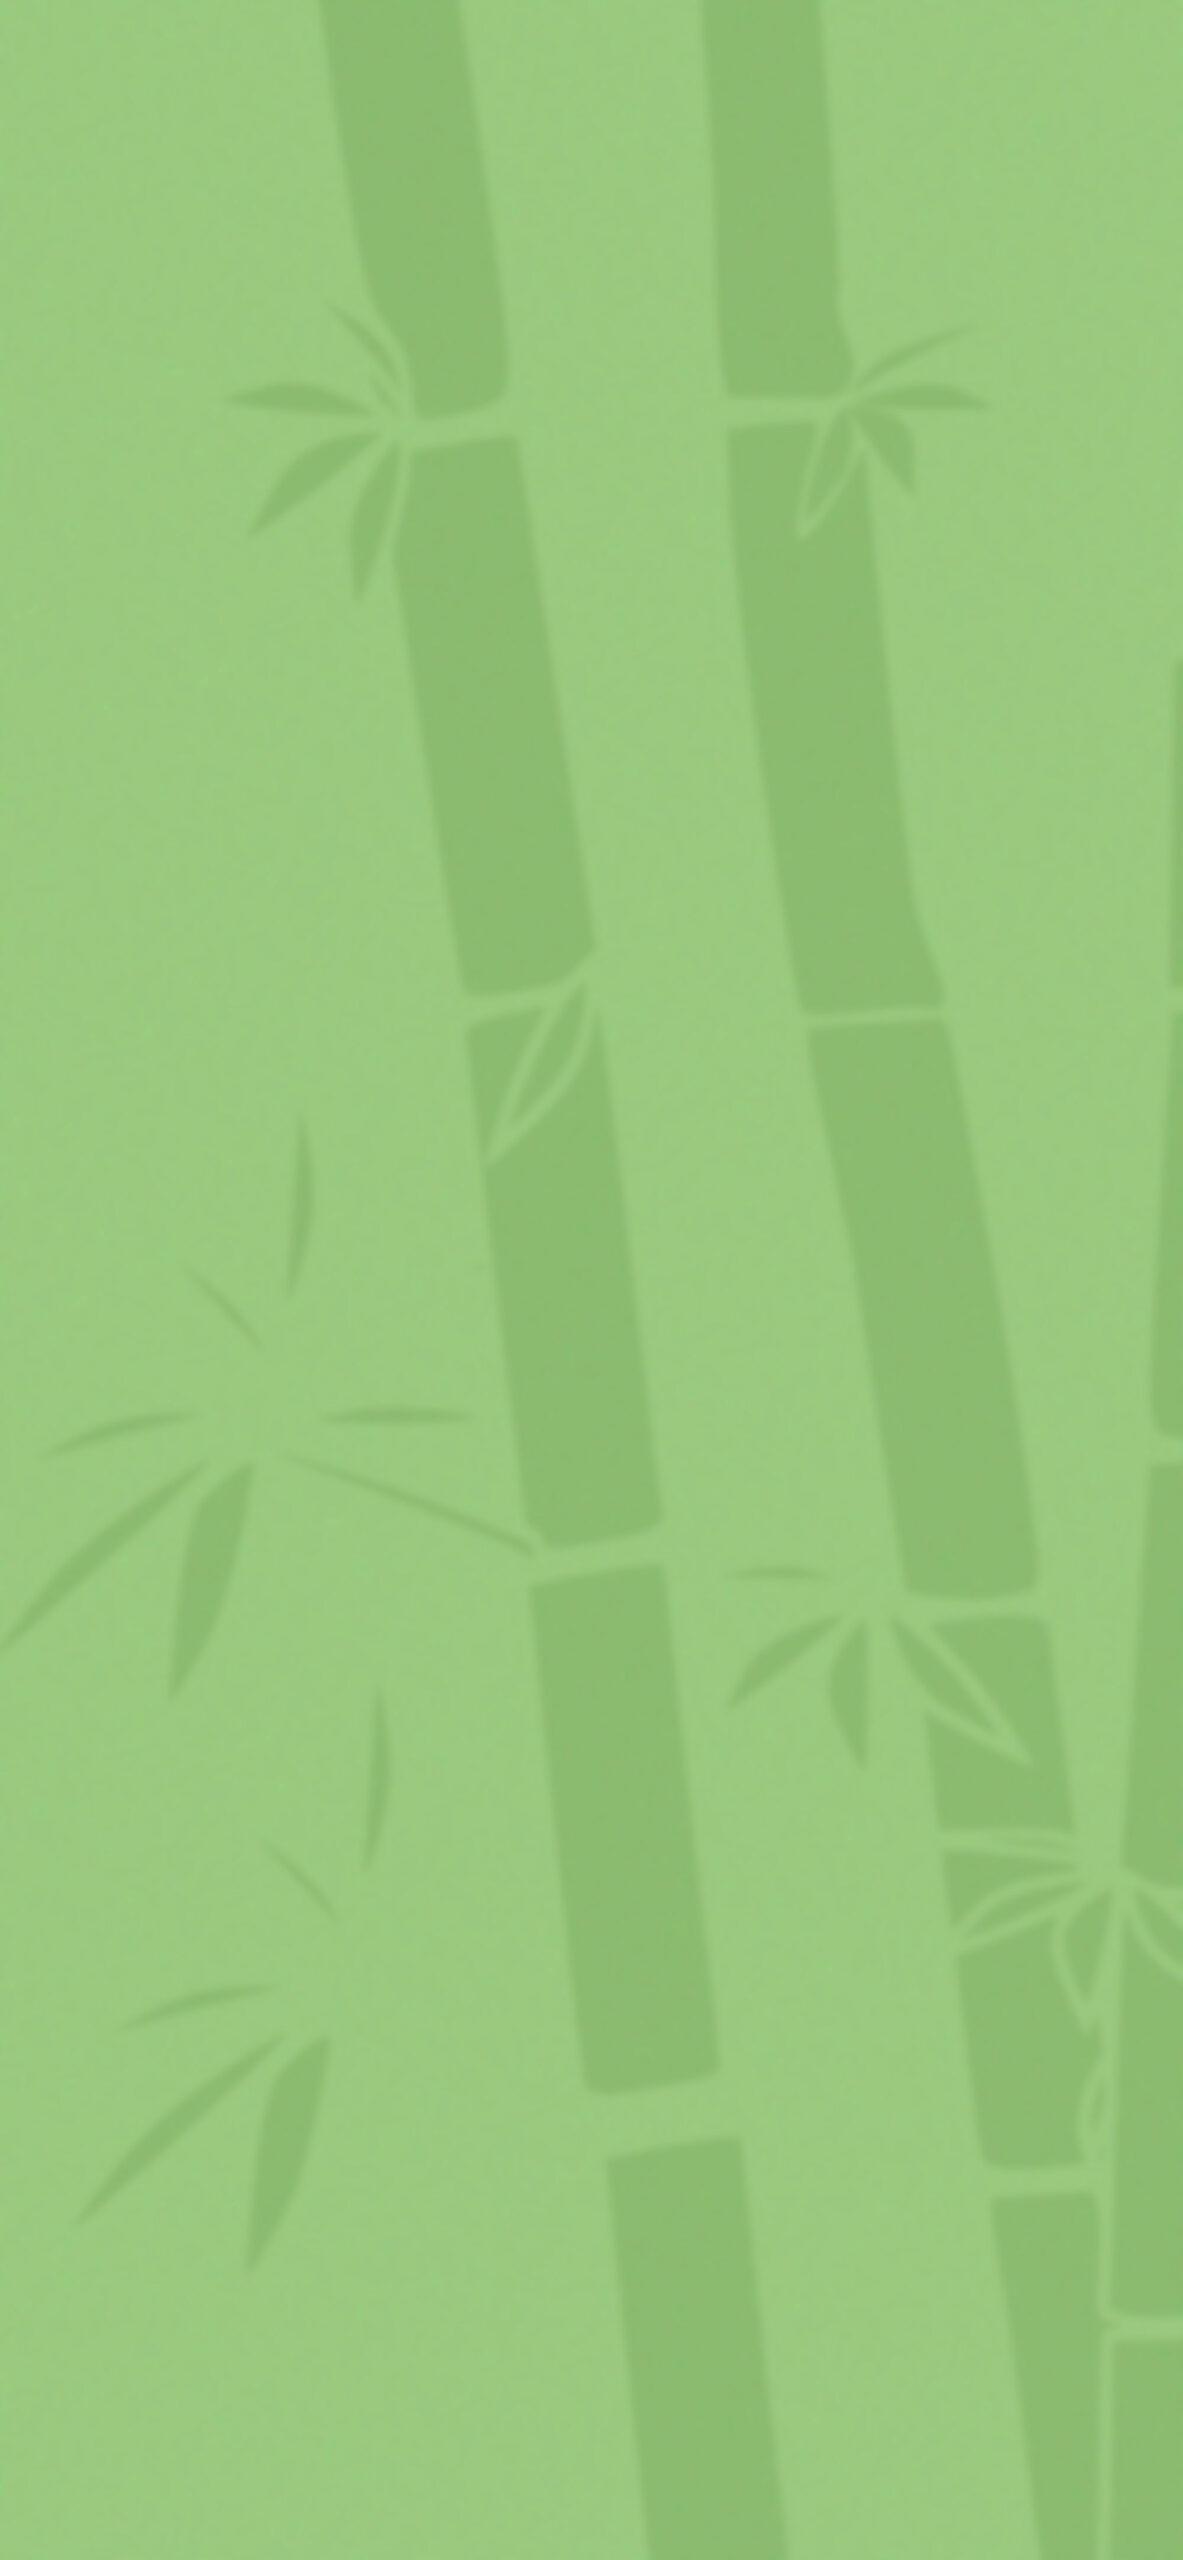 demon slayer nezuko kamado green background